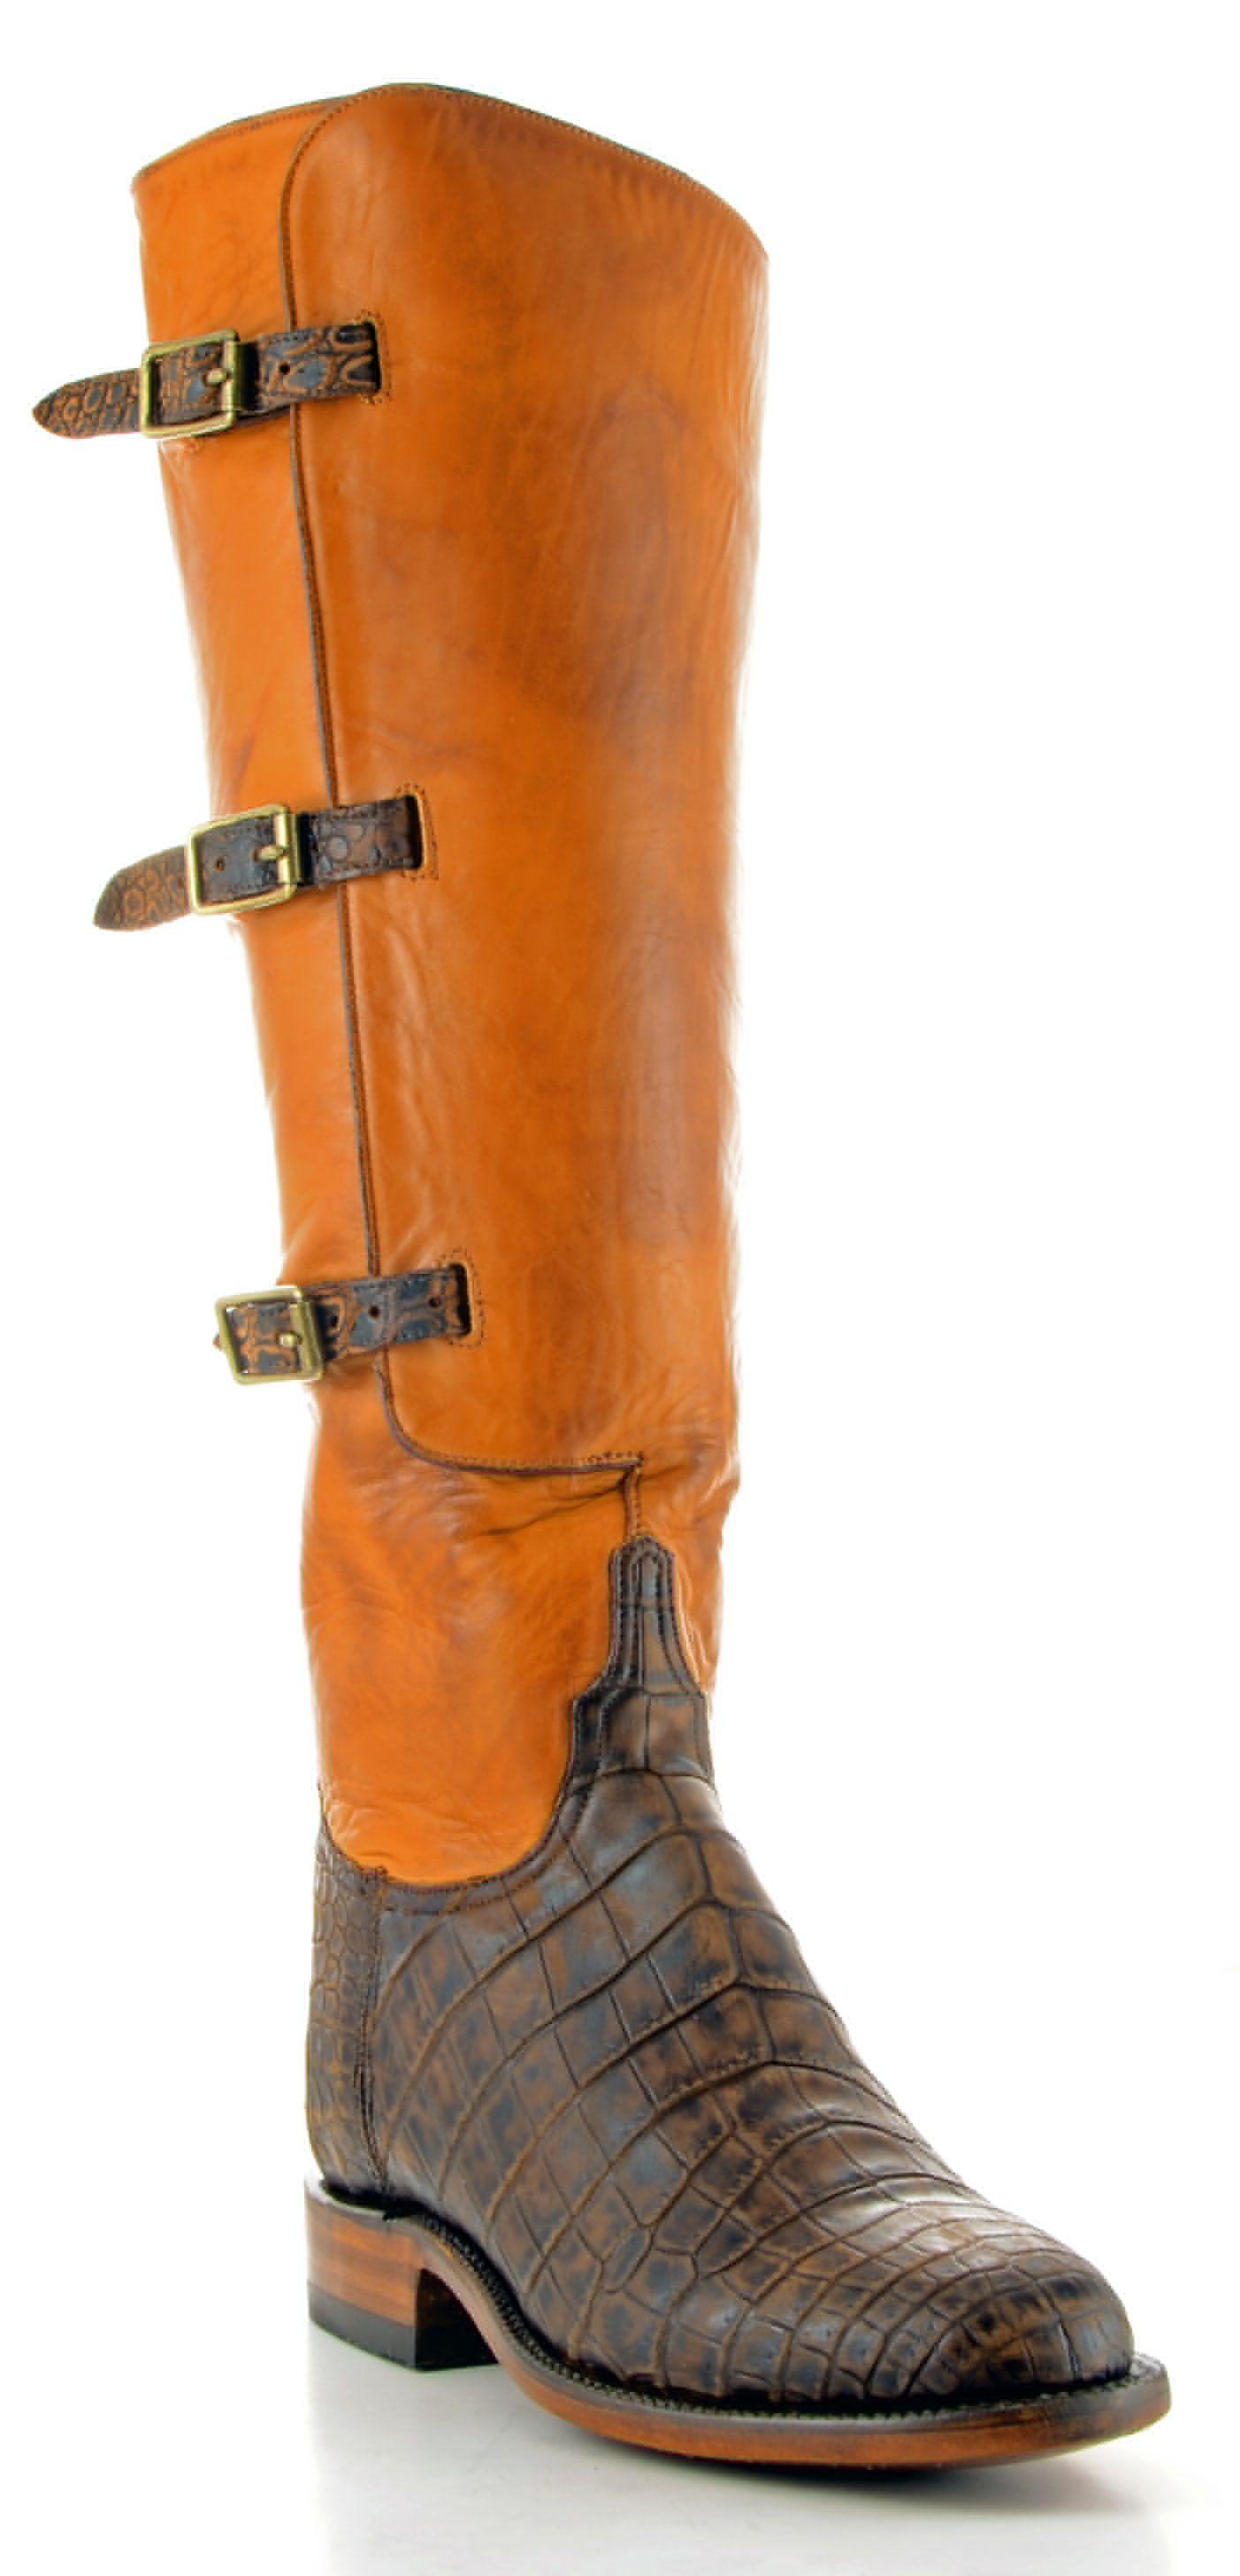 1533ddd8e Womens Lucchese Classics Croc Belly Boots Safari  Gb9890